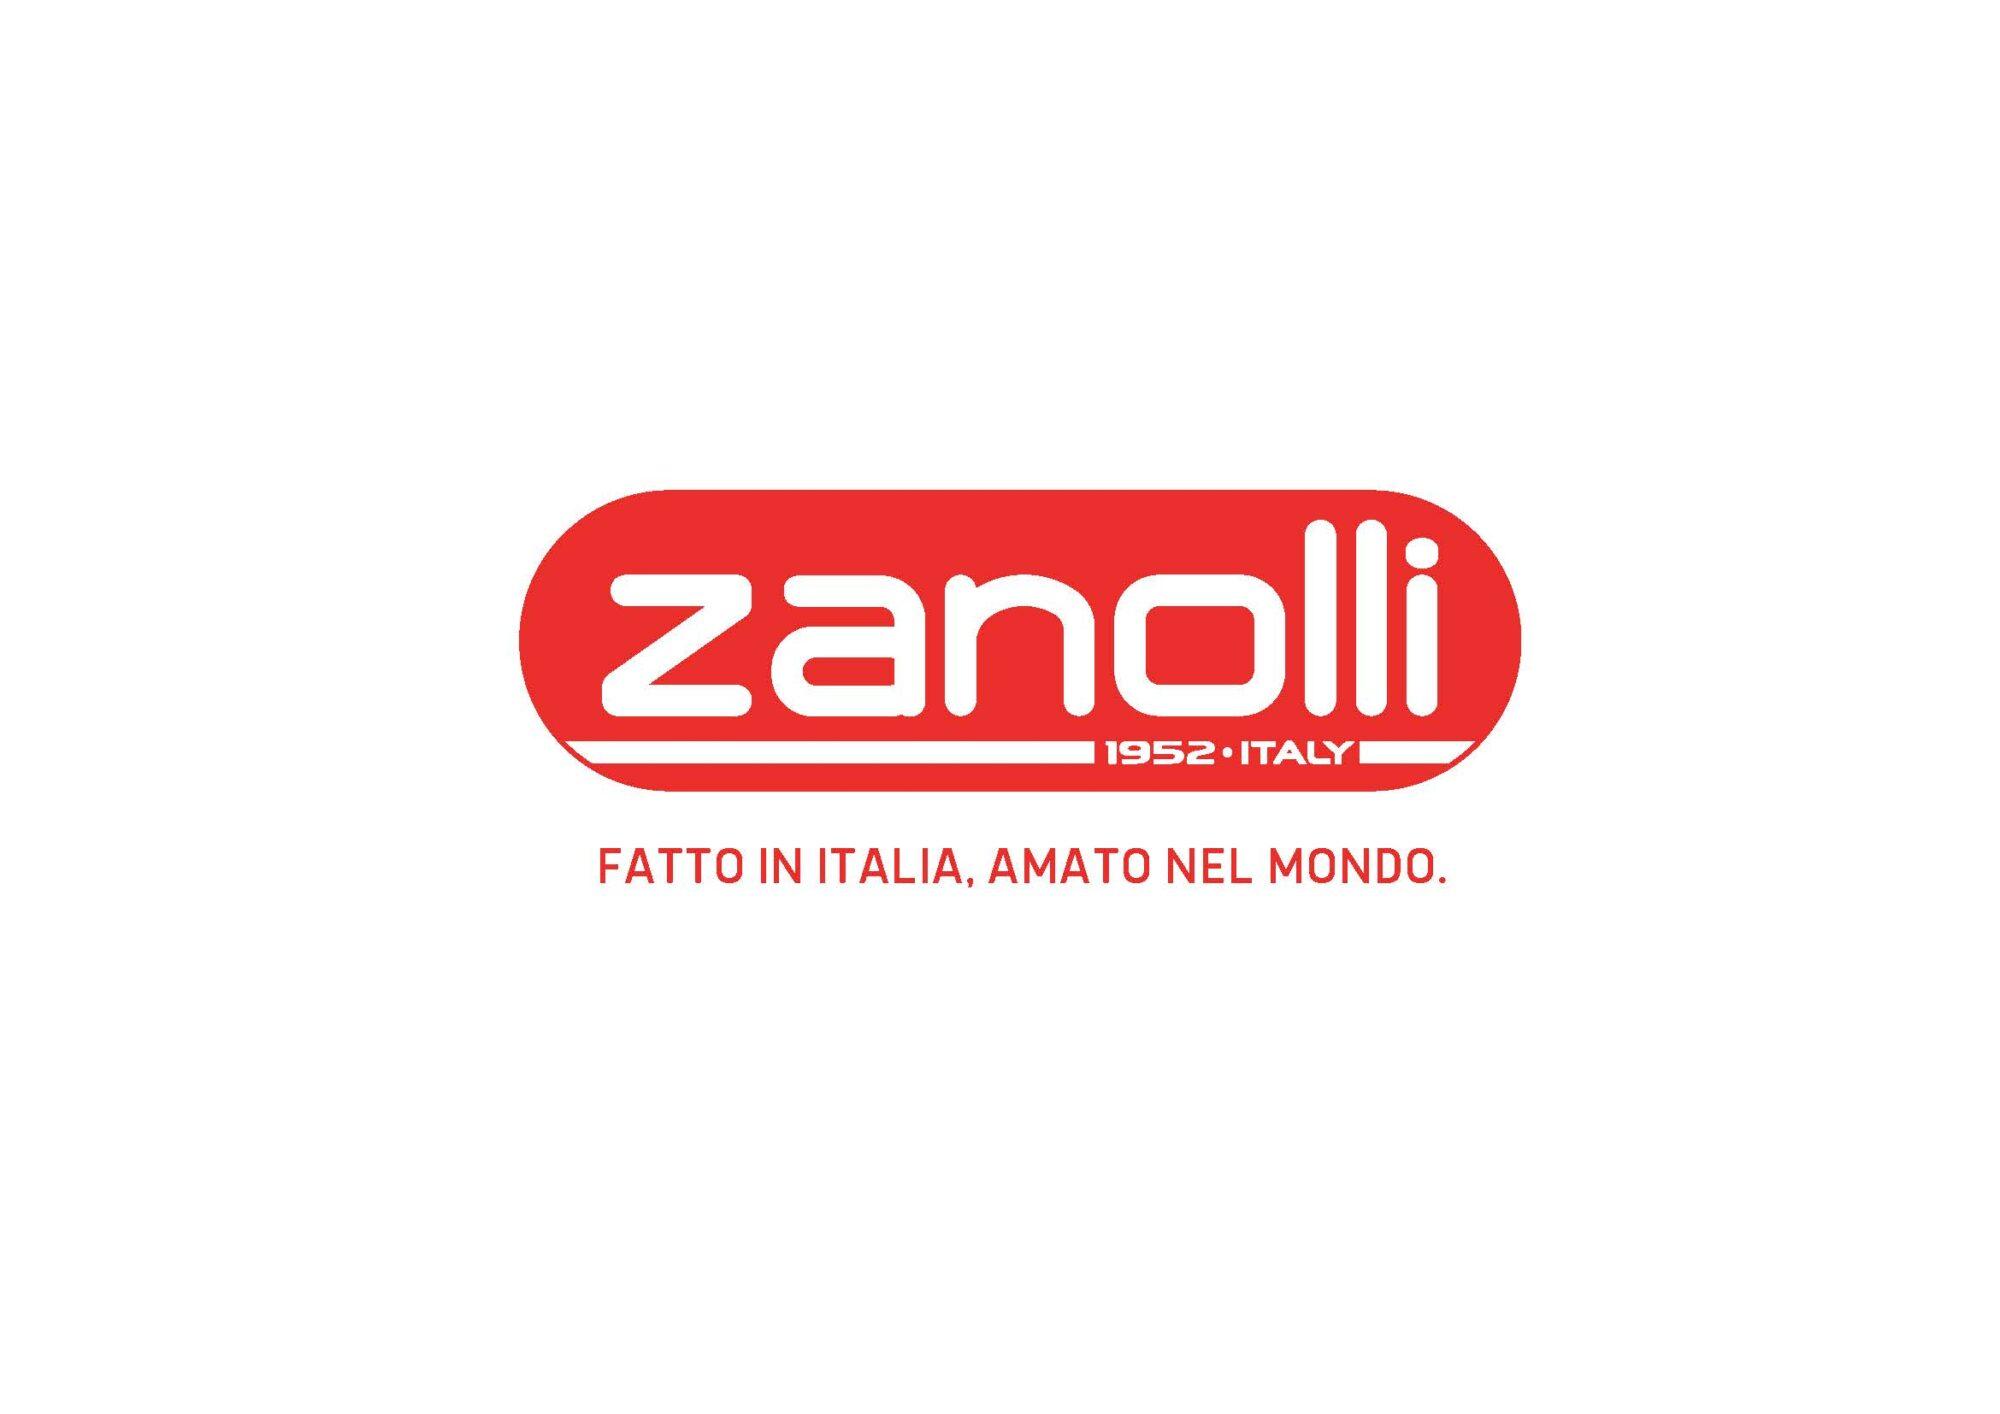 DR. ZANOLLI SRL